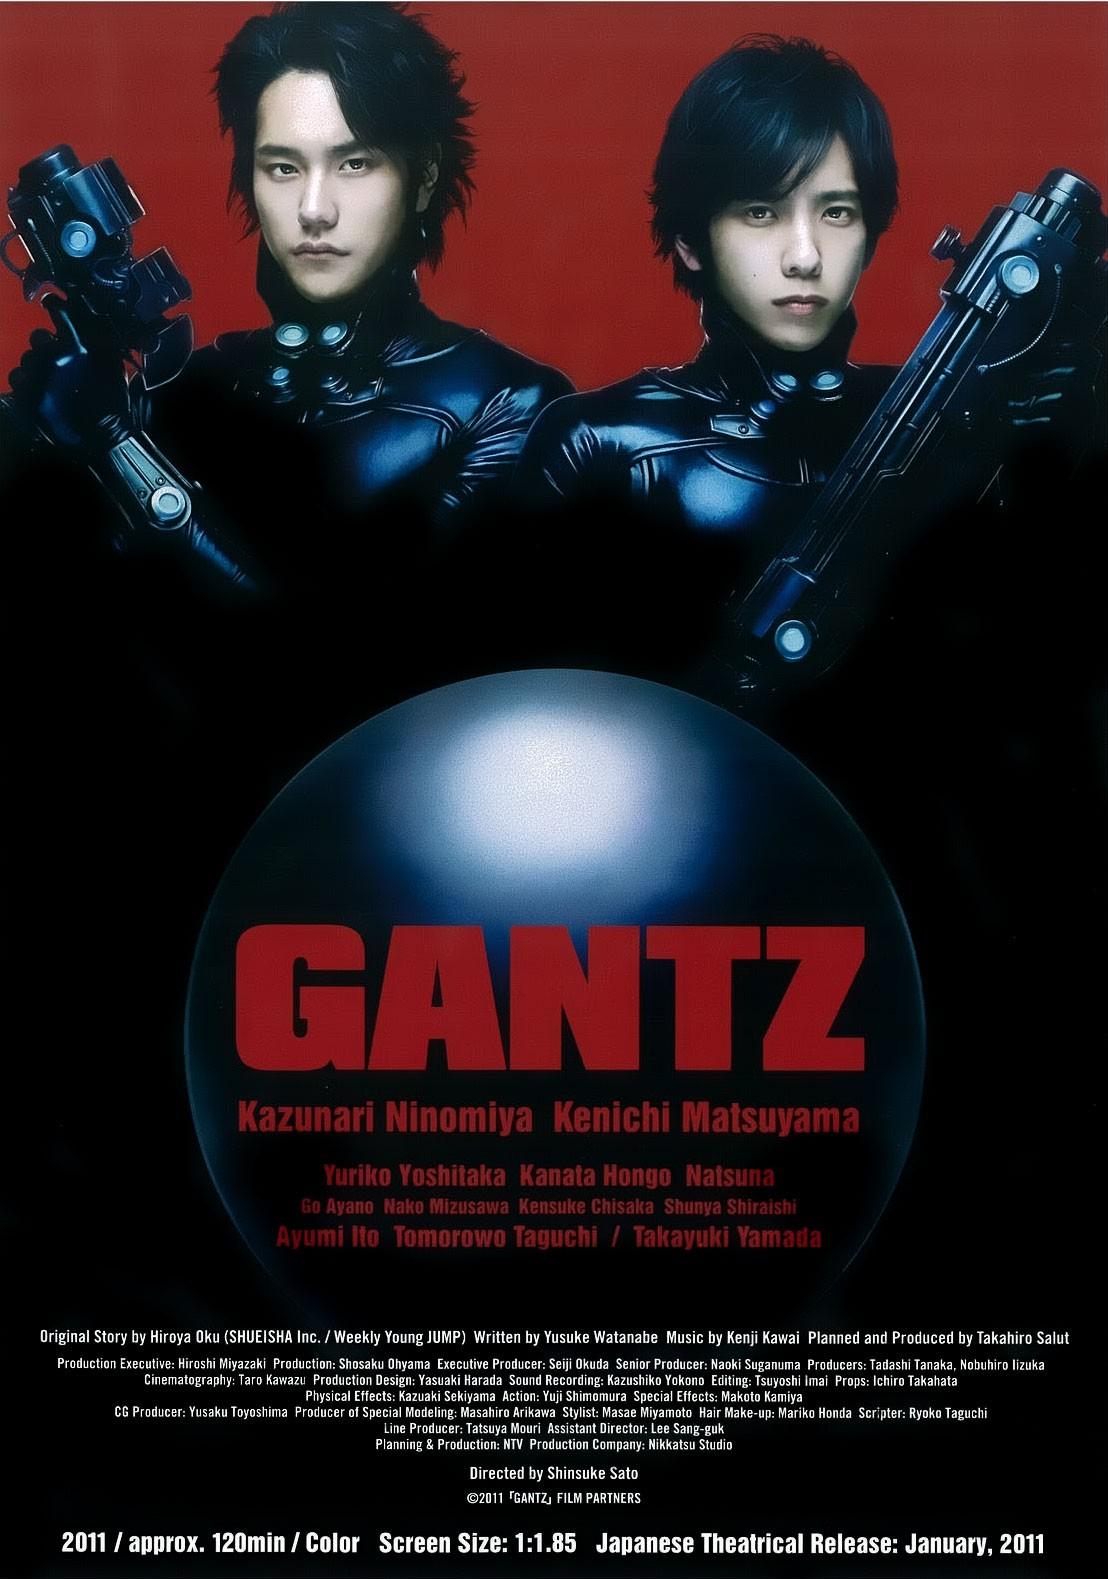 [MULTI] Gantz 1 et 2 [DVDRiP - BRRiP] [MP4]